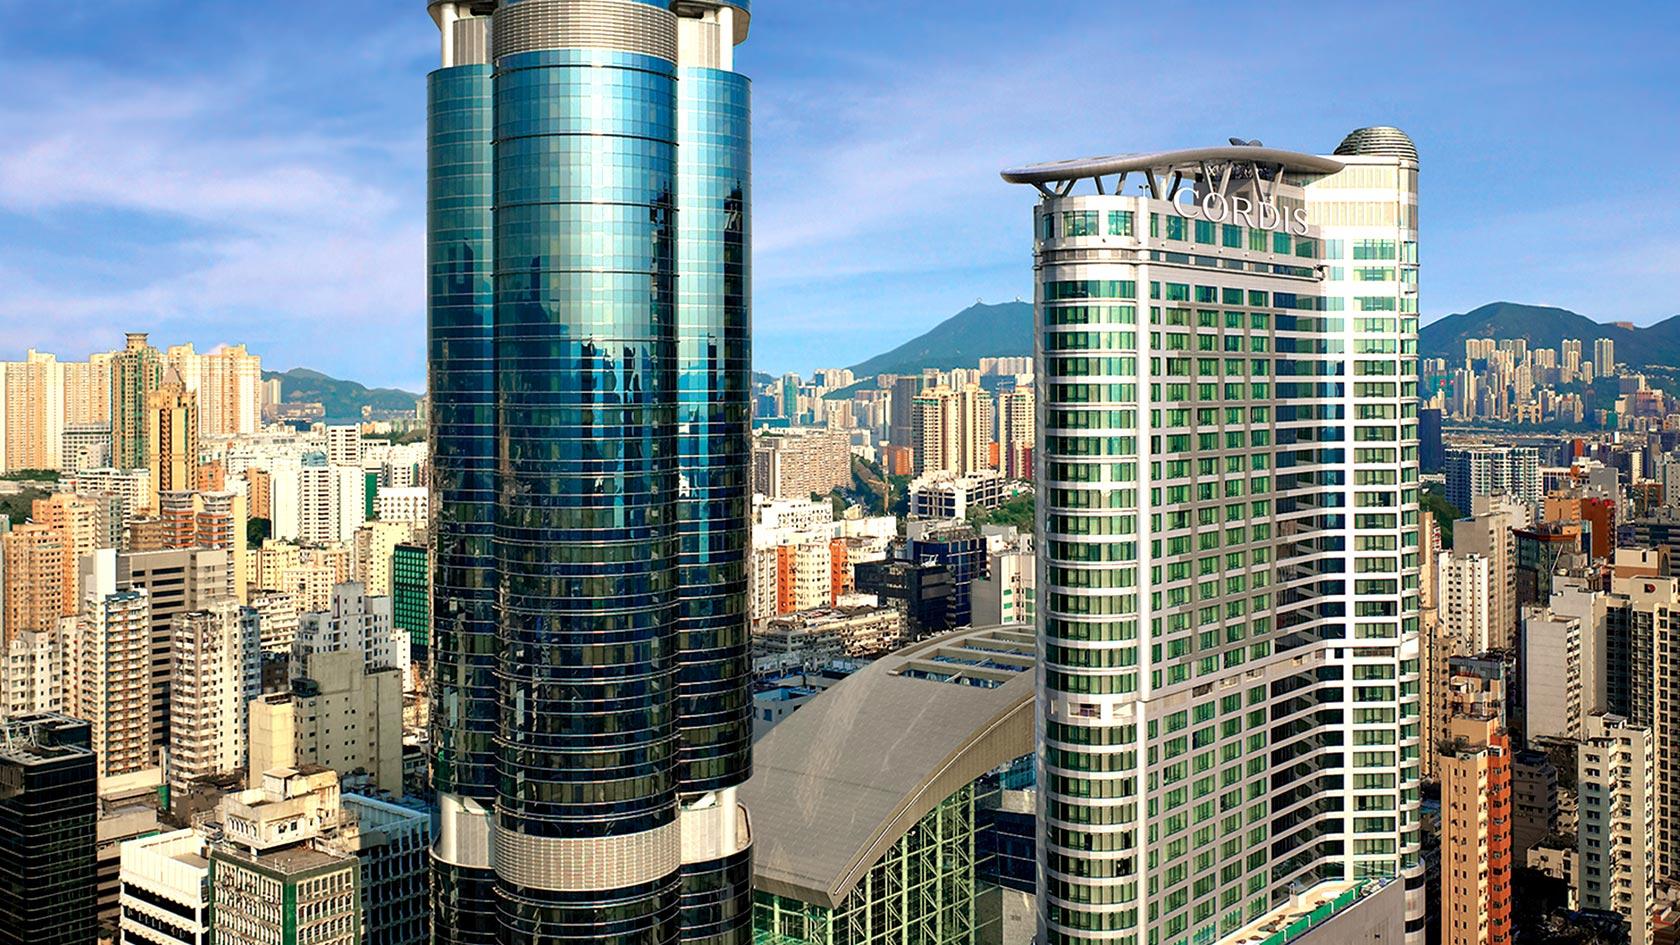 cordis club lounge hong kong hotel architecture